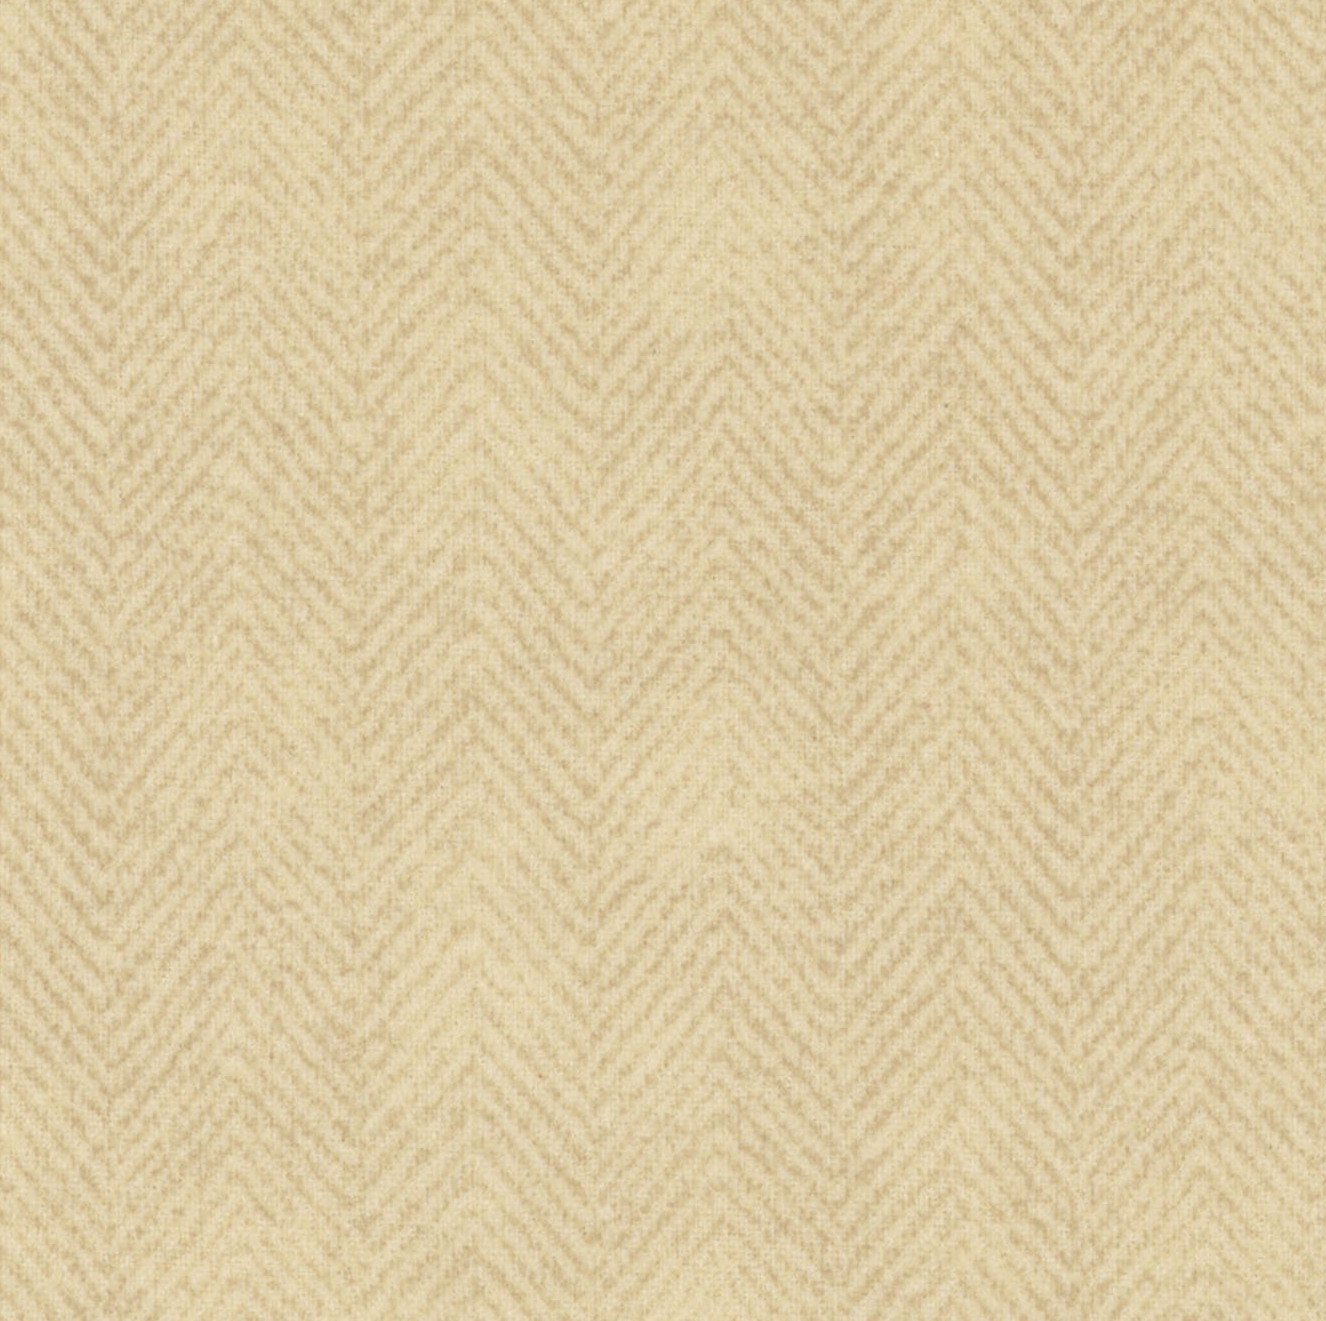 Woolies Flannel Herringbone Beige / Tan (MASF1841-T)